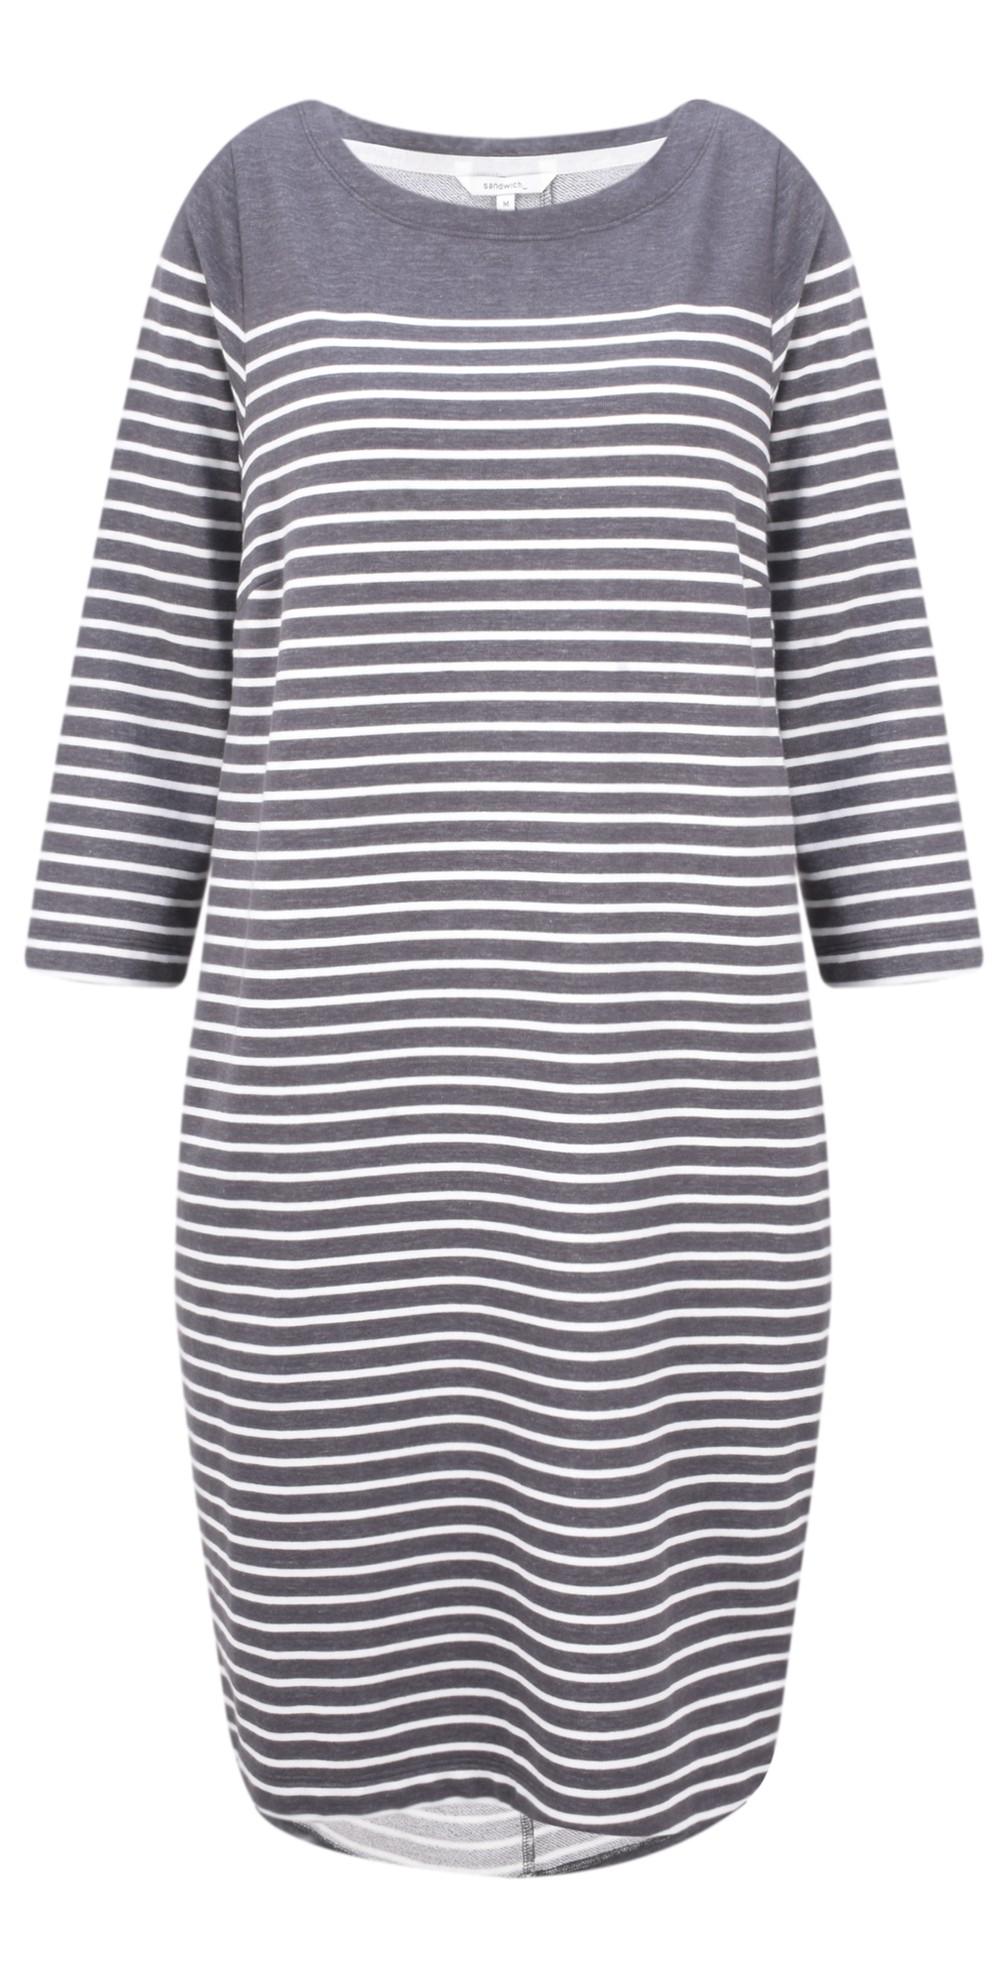 Stripe Print French Terry Dress main image